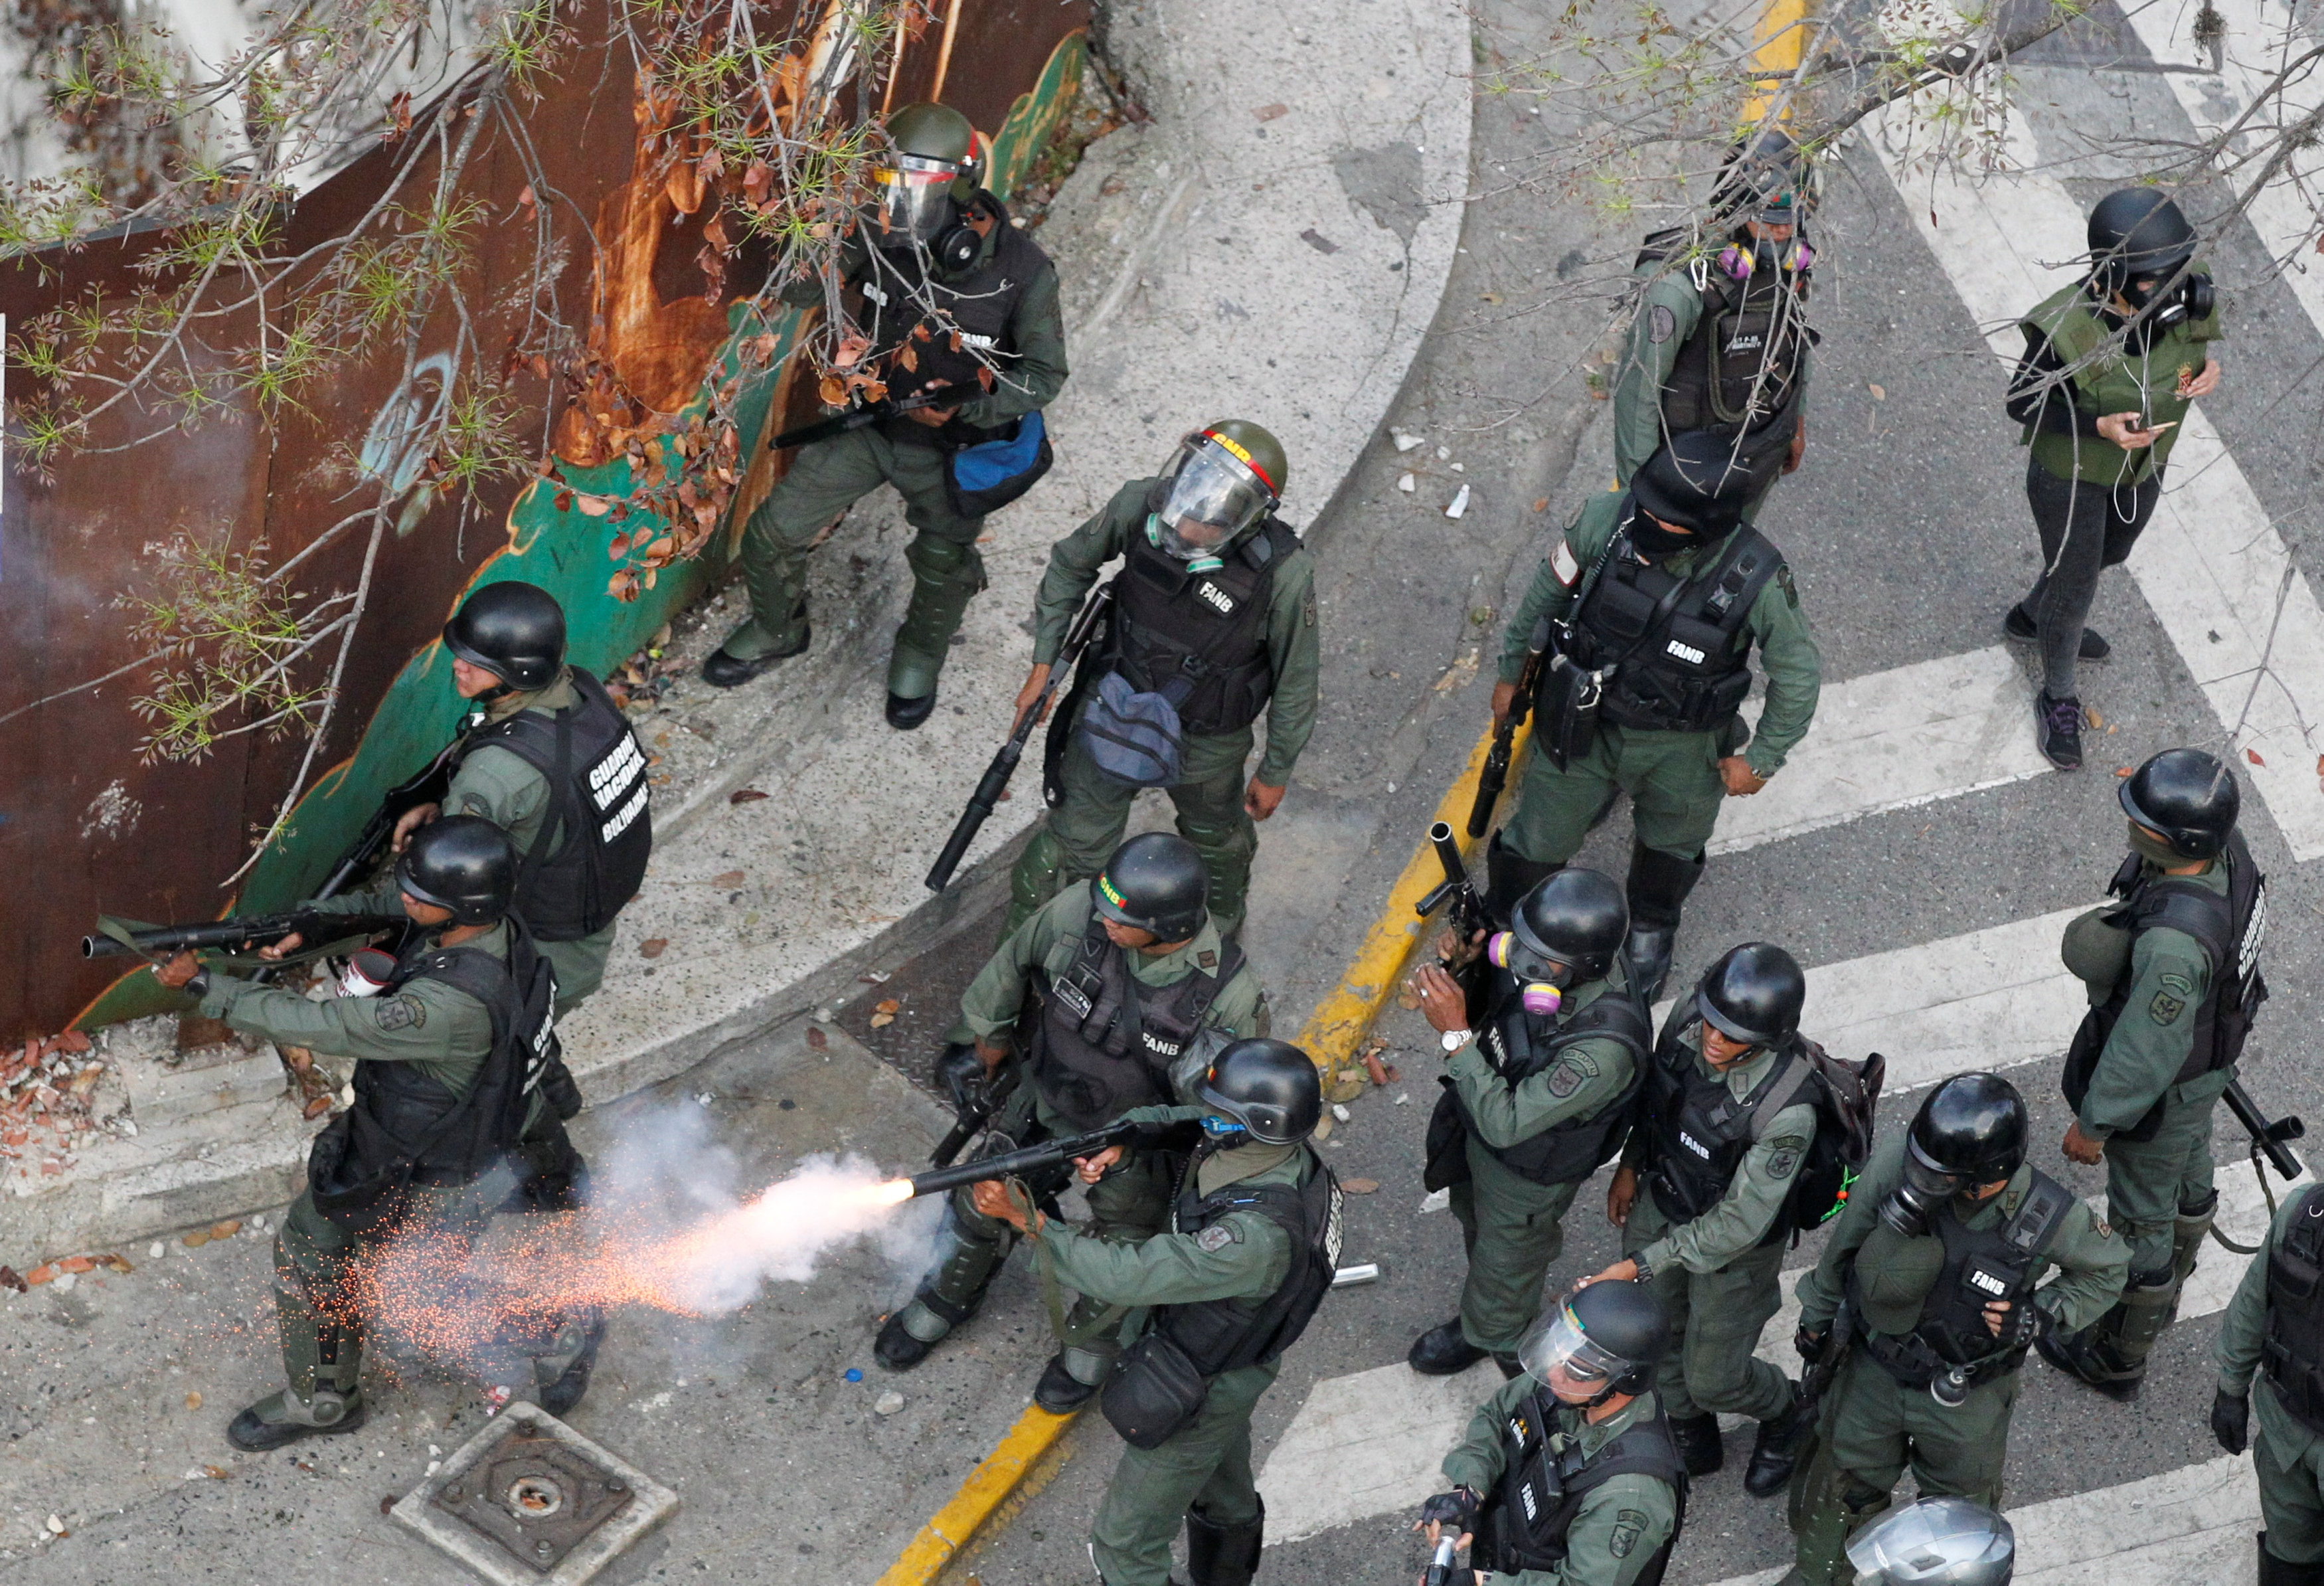 Riot police fire tear gas during a rally against Venezuela's President Nicolas Maduro's government in Caracas, Venezuela April 10, 2017. REUTERS/Christian Veron